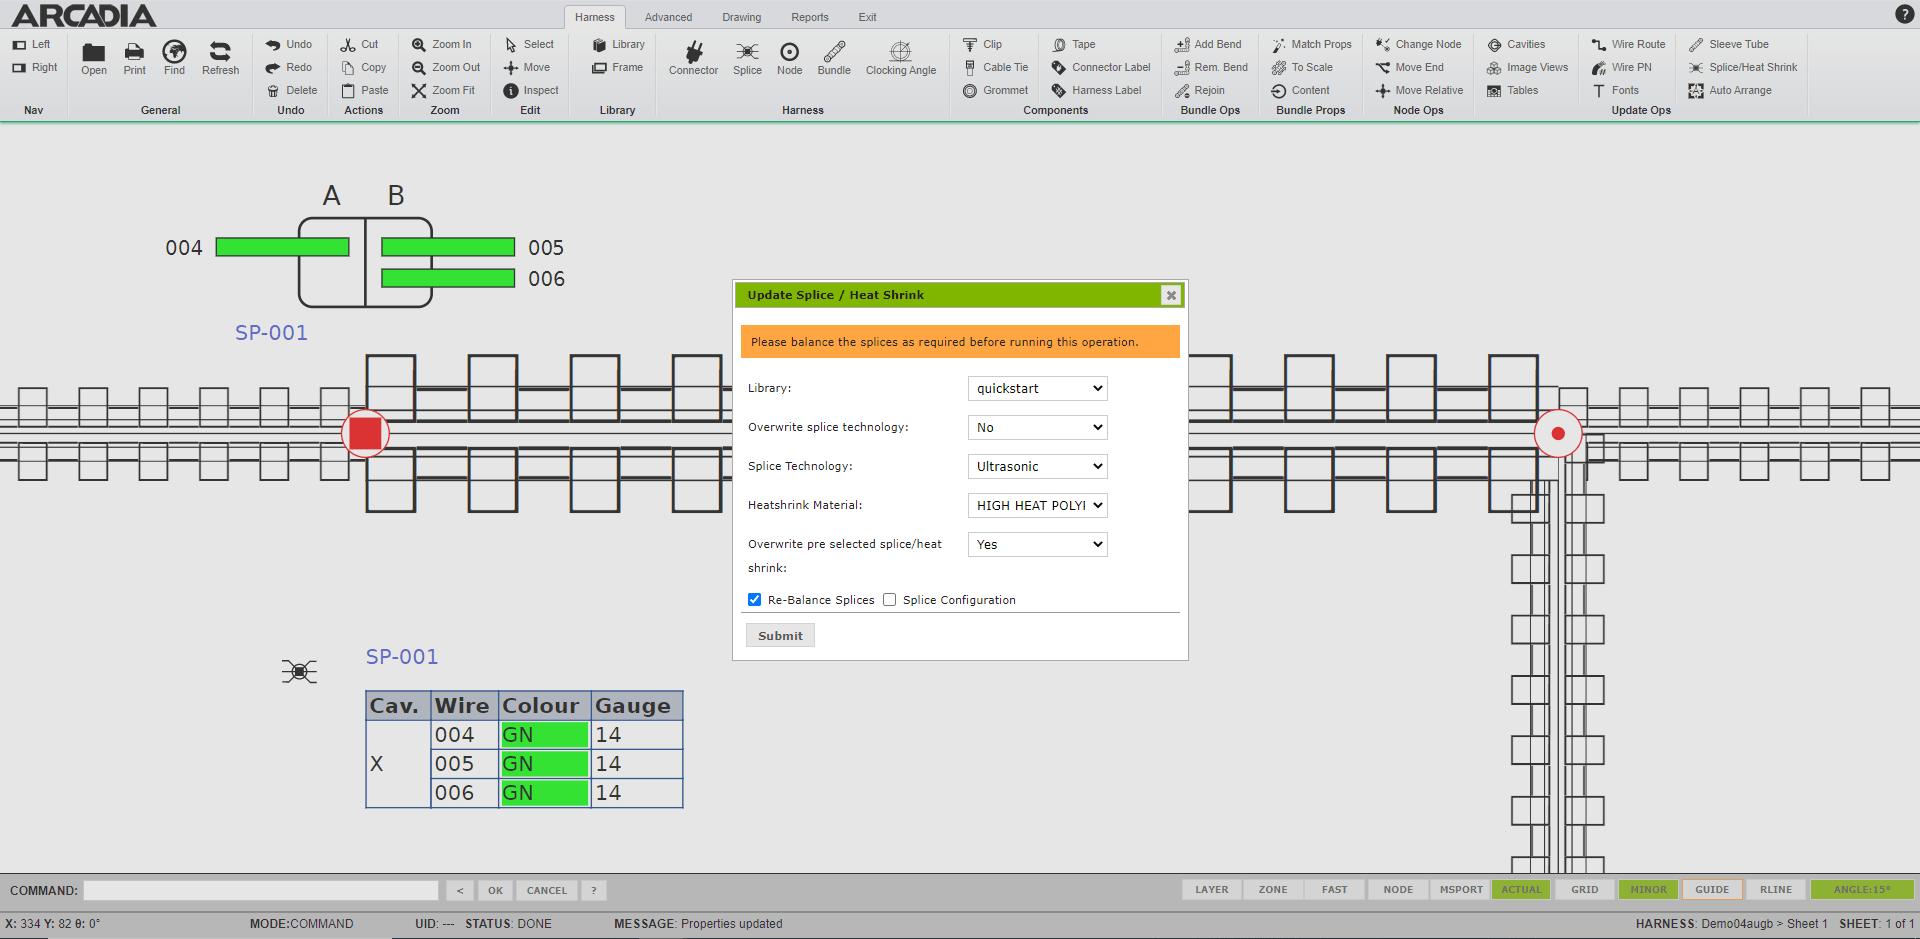 empalme de alambre de diseño de empalmes de software empalme